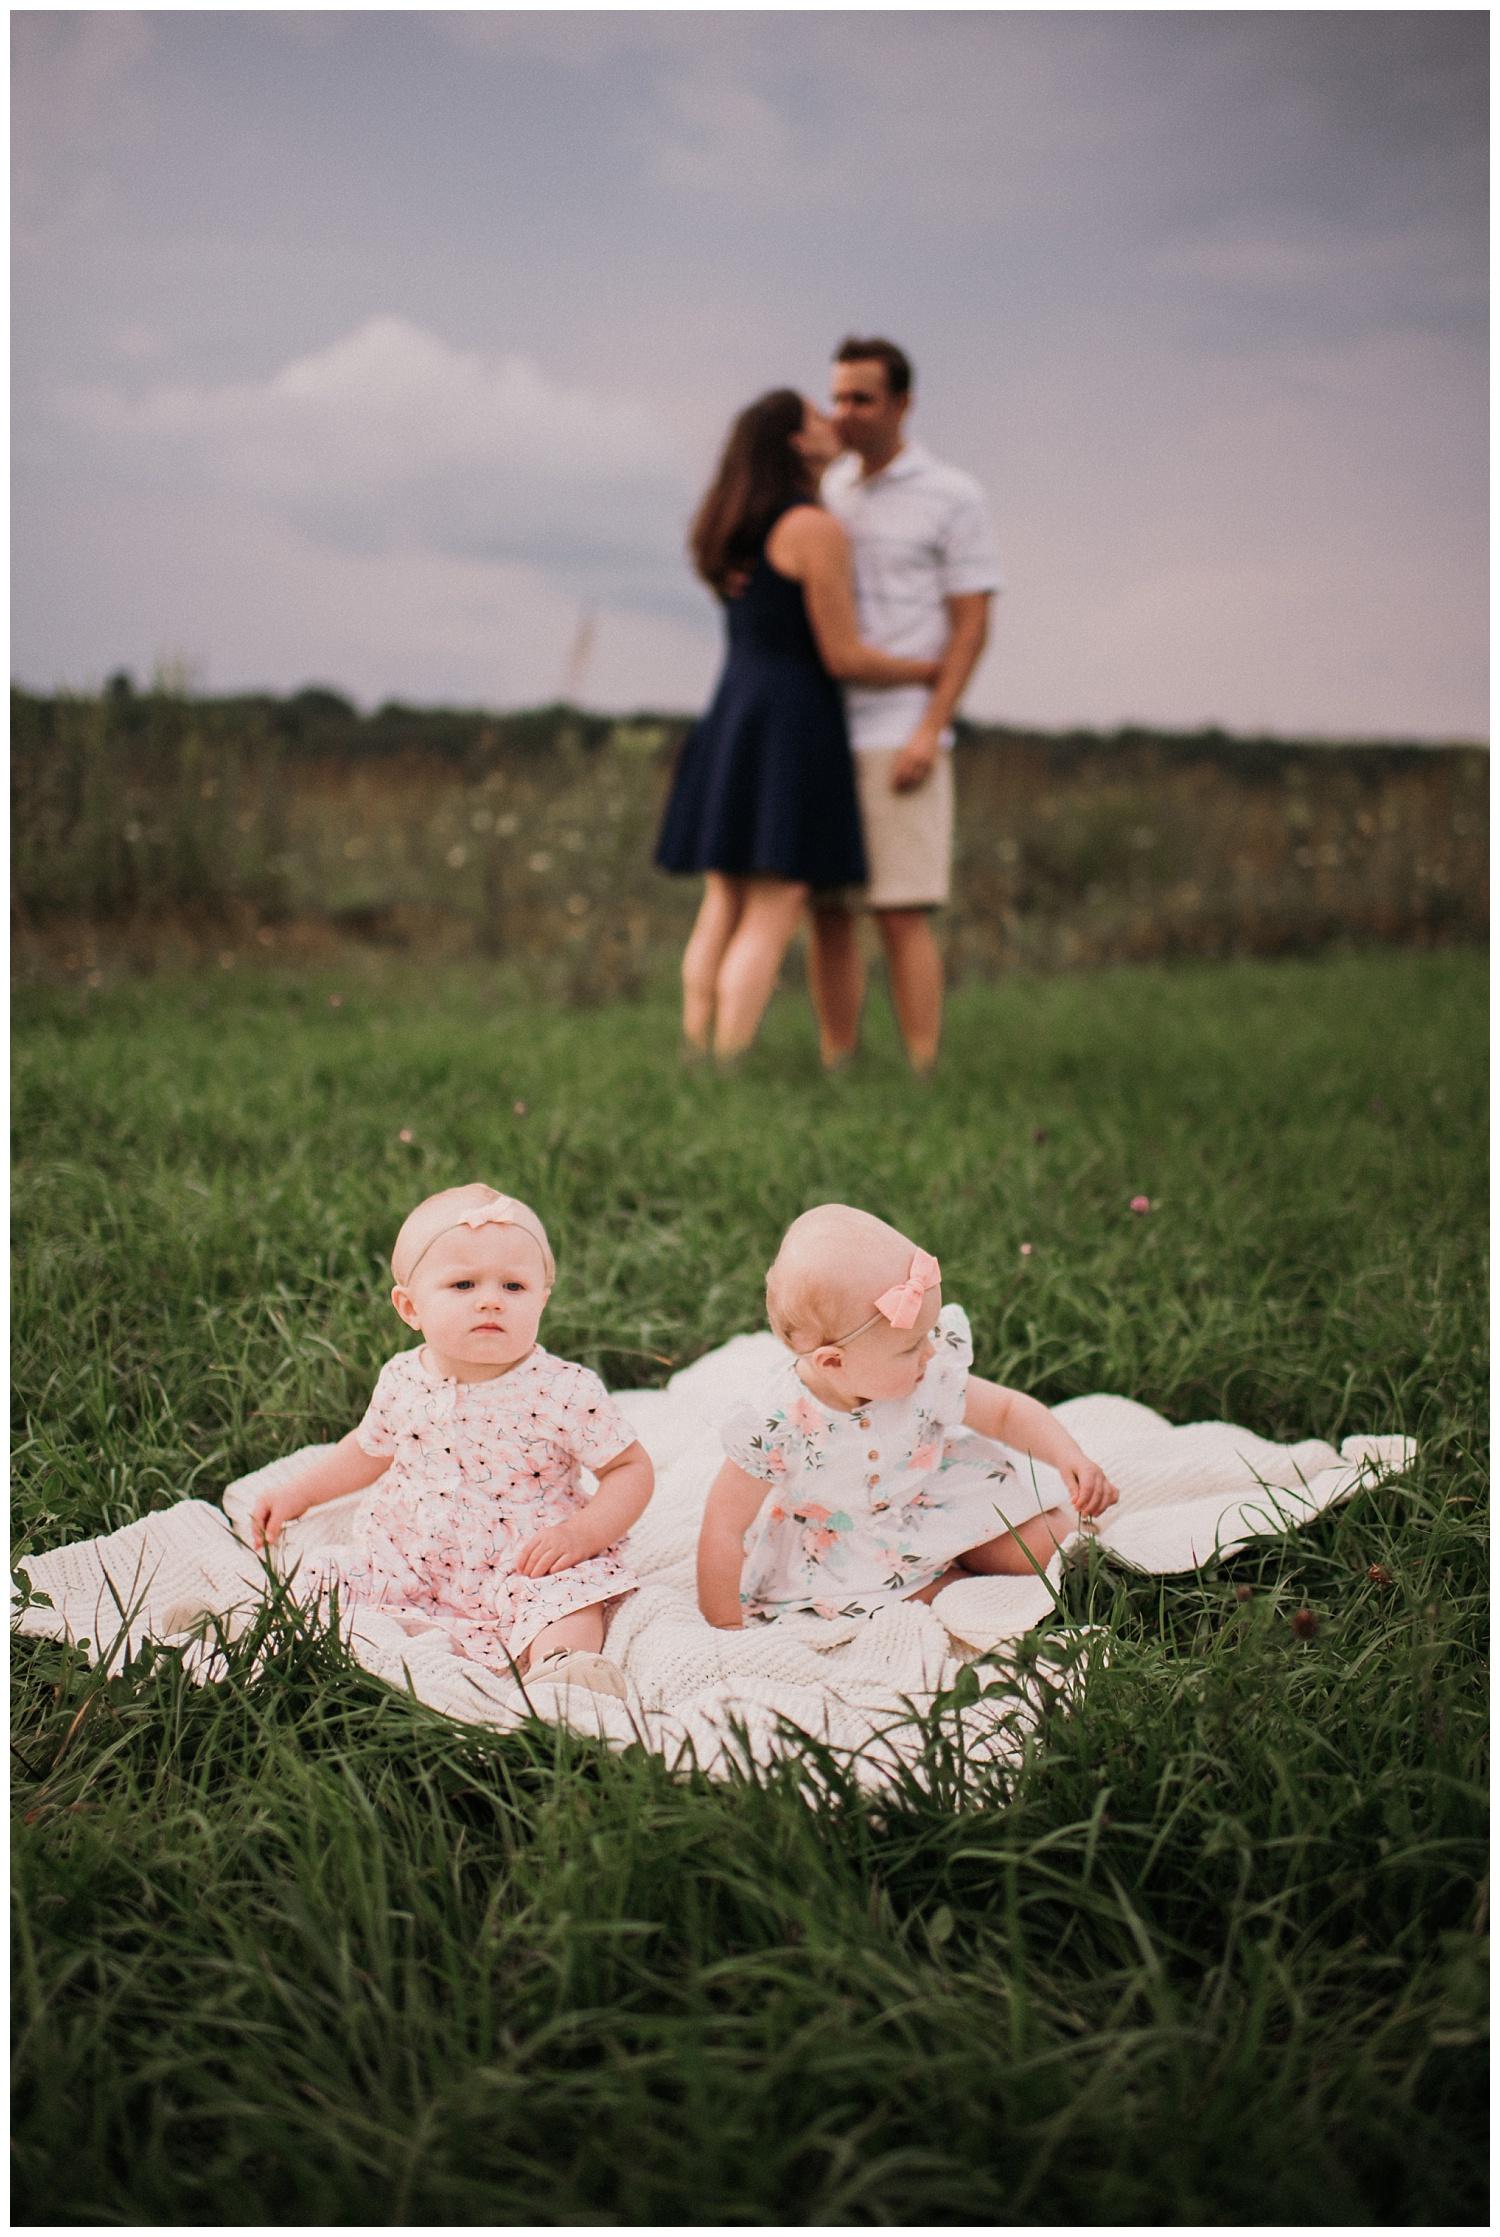 Pewaukee-family-photographer-2019 (14).jpg